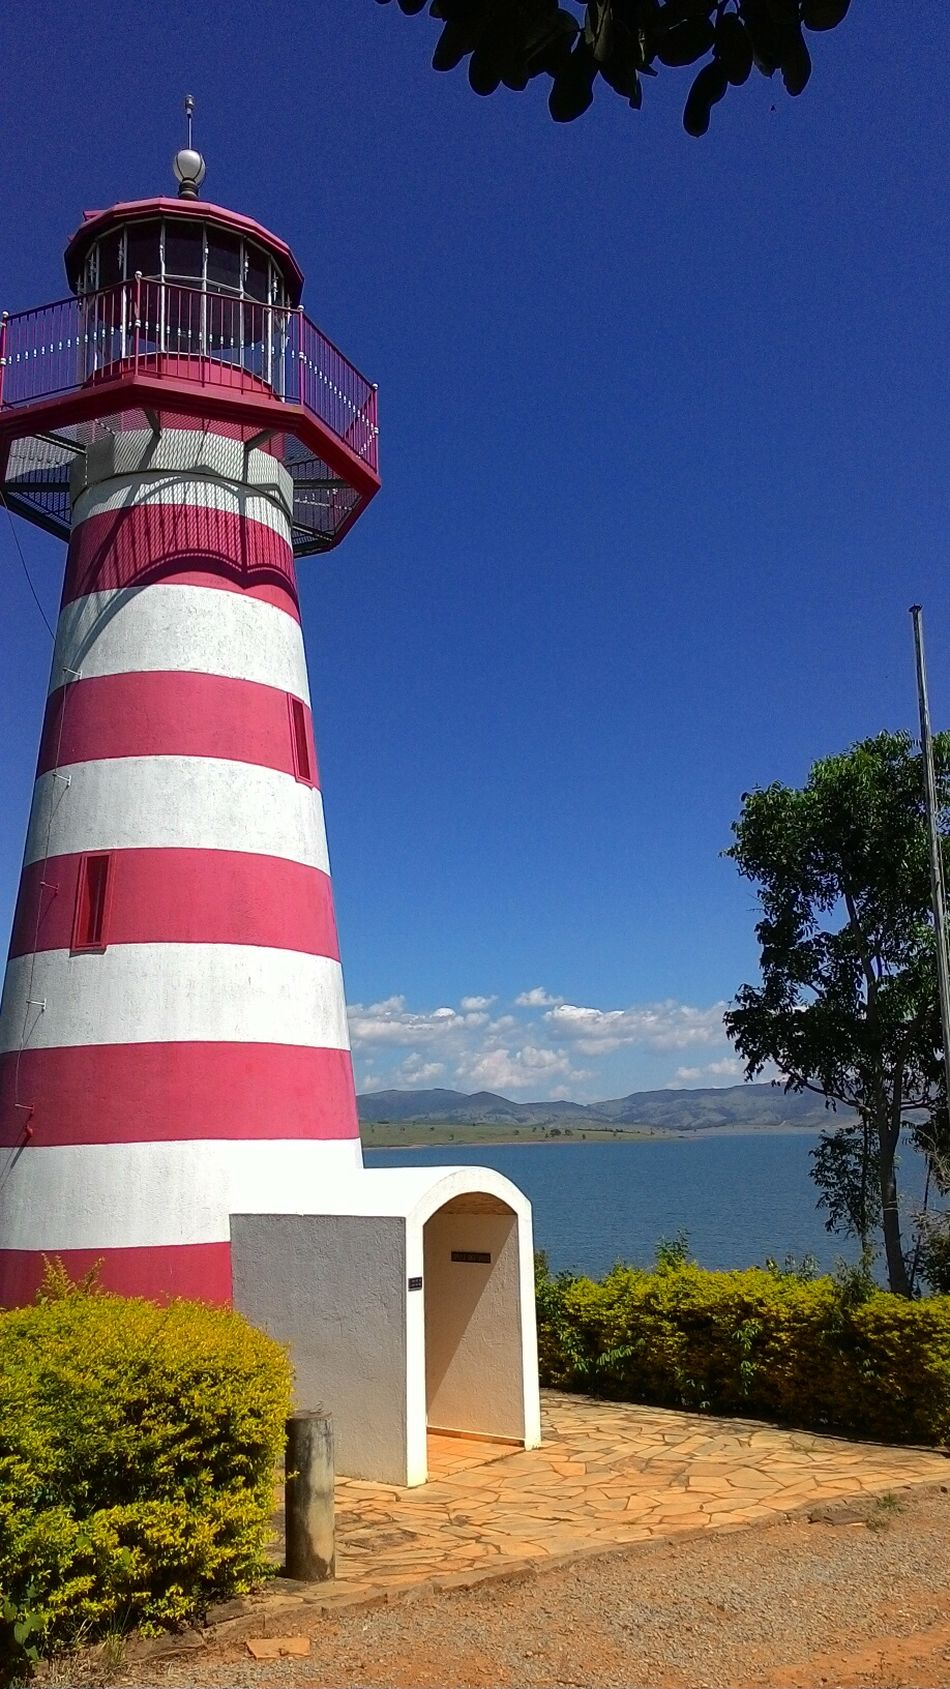 Lighthouse Lake Lakeshore Brazil